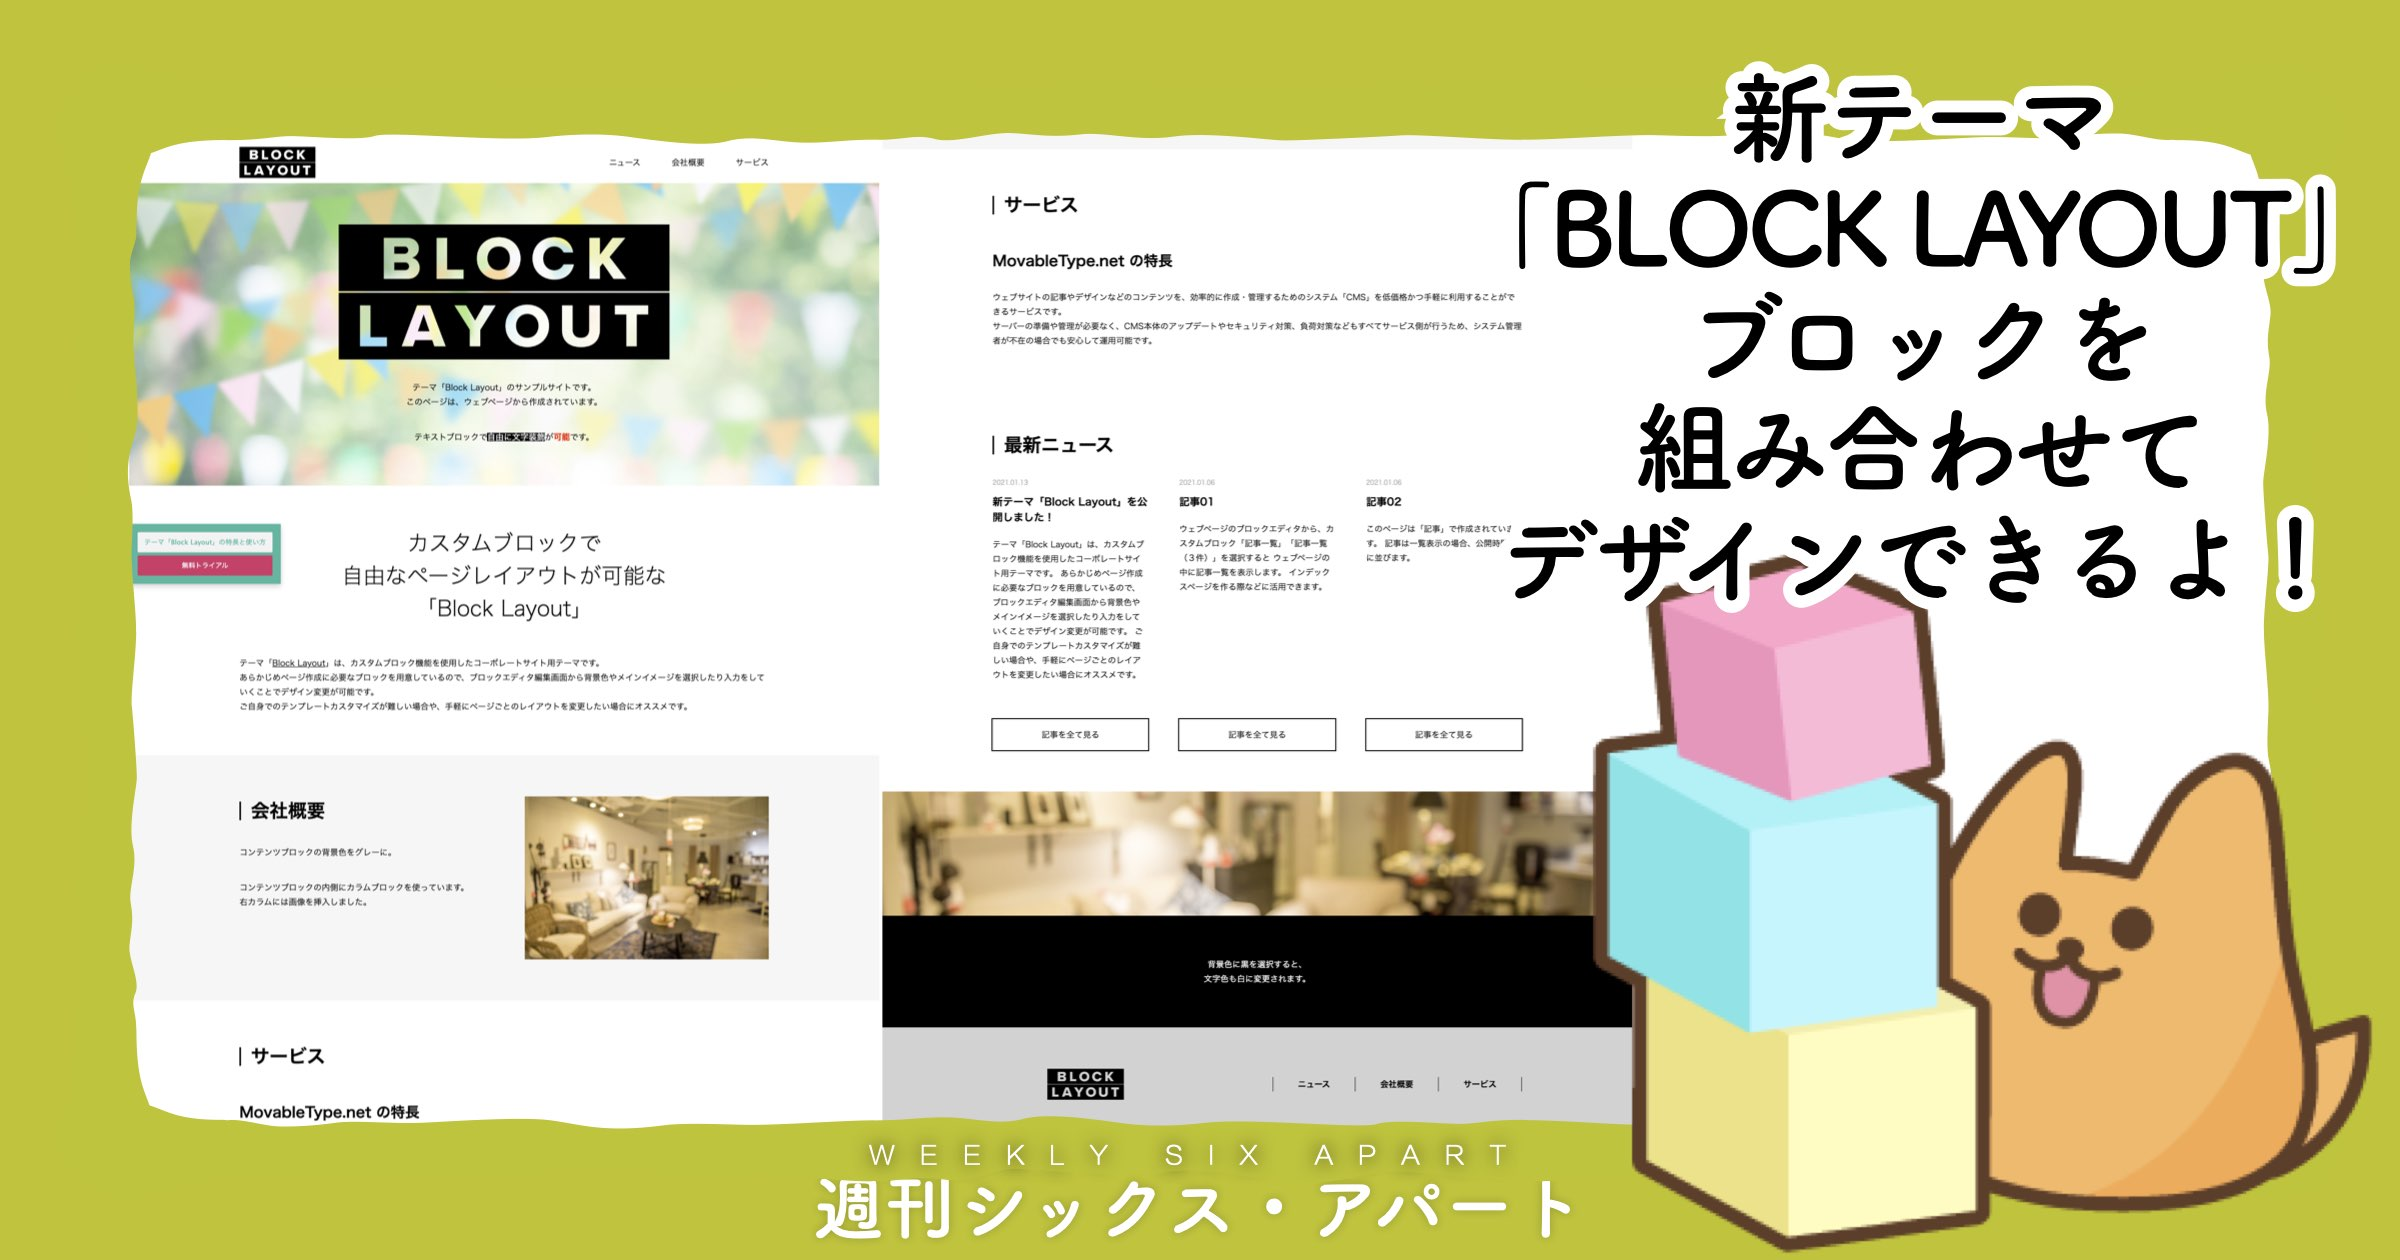 blocklayout.jpg